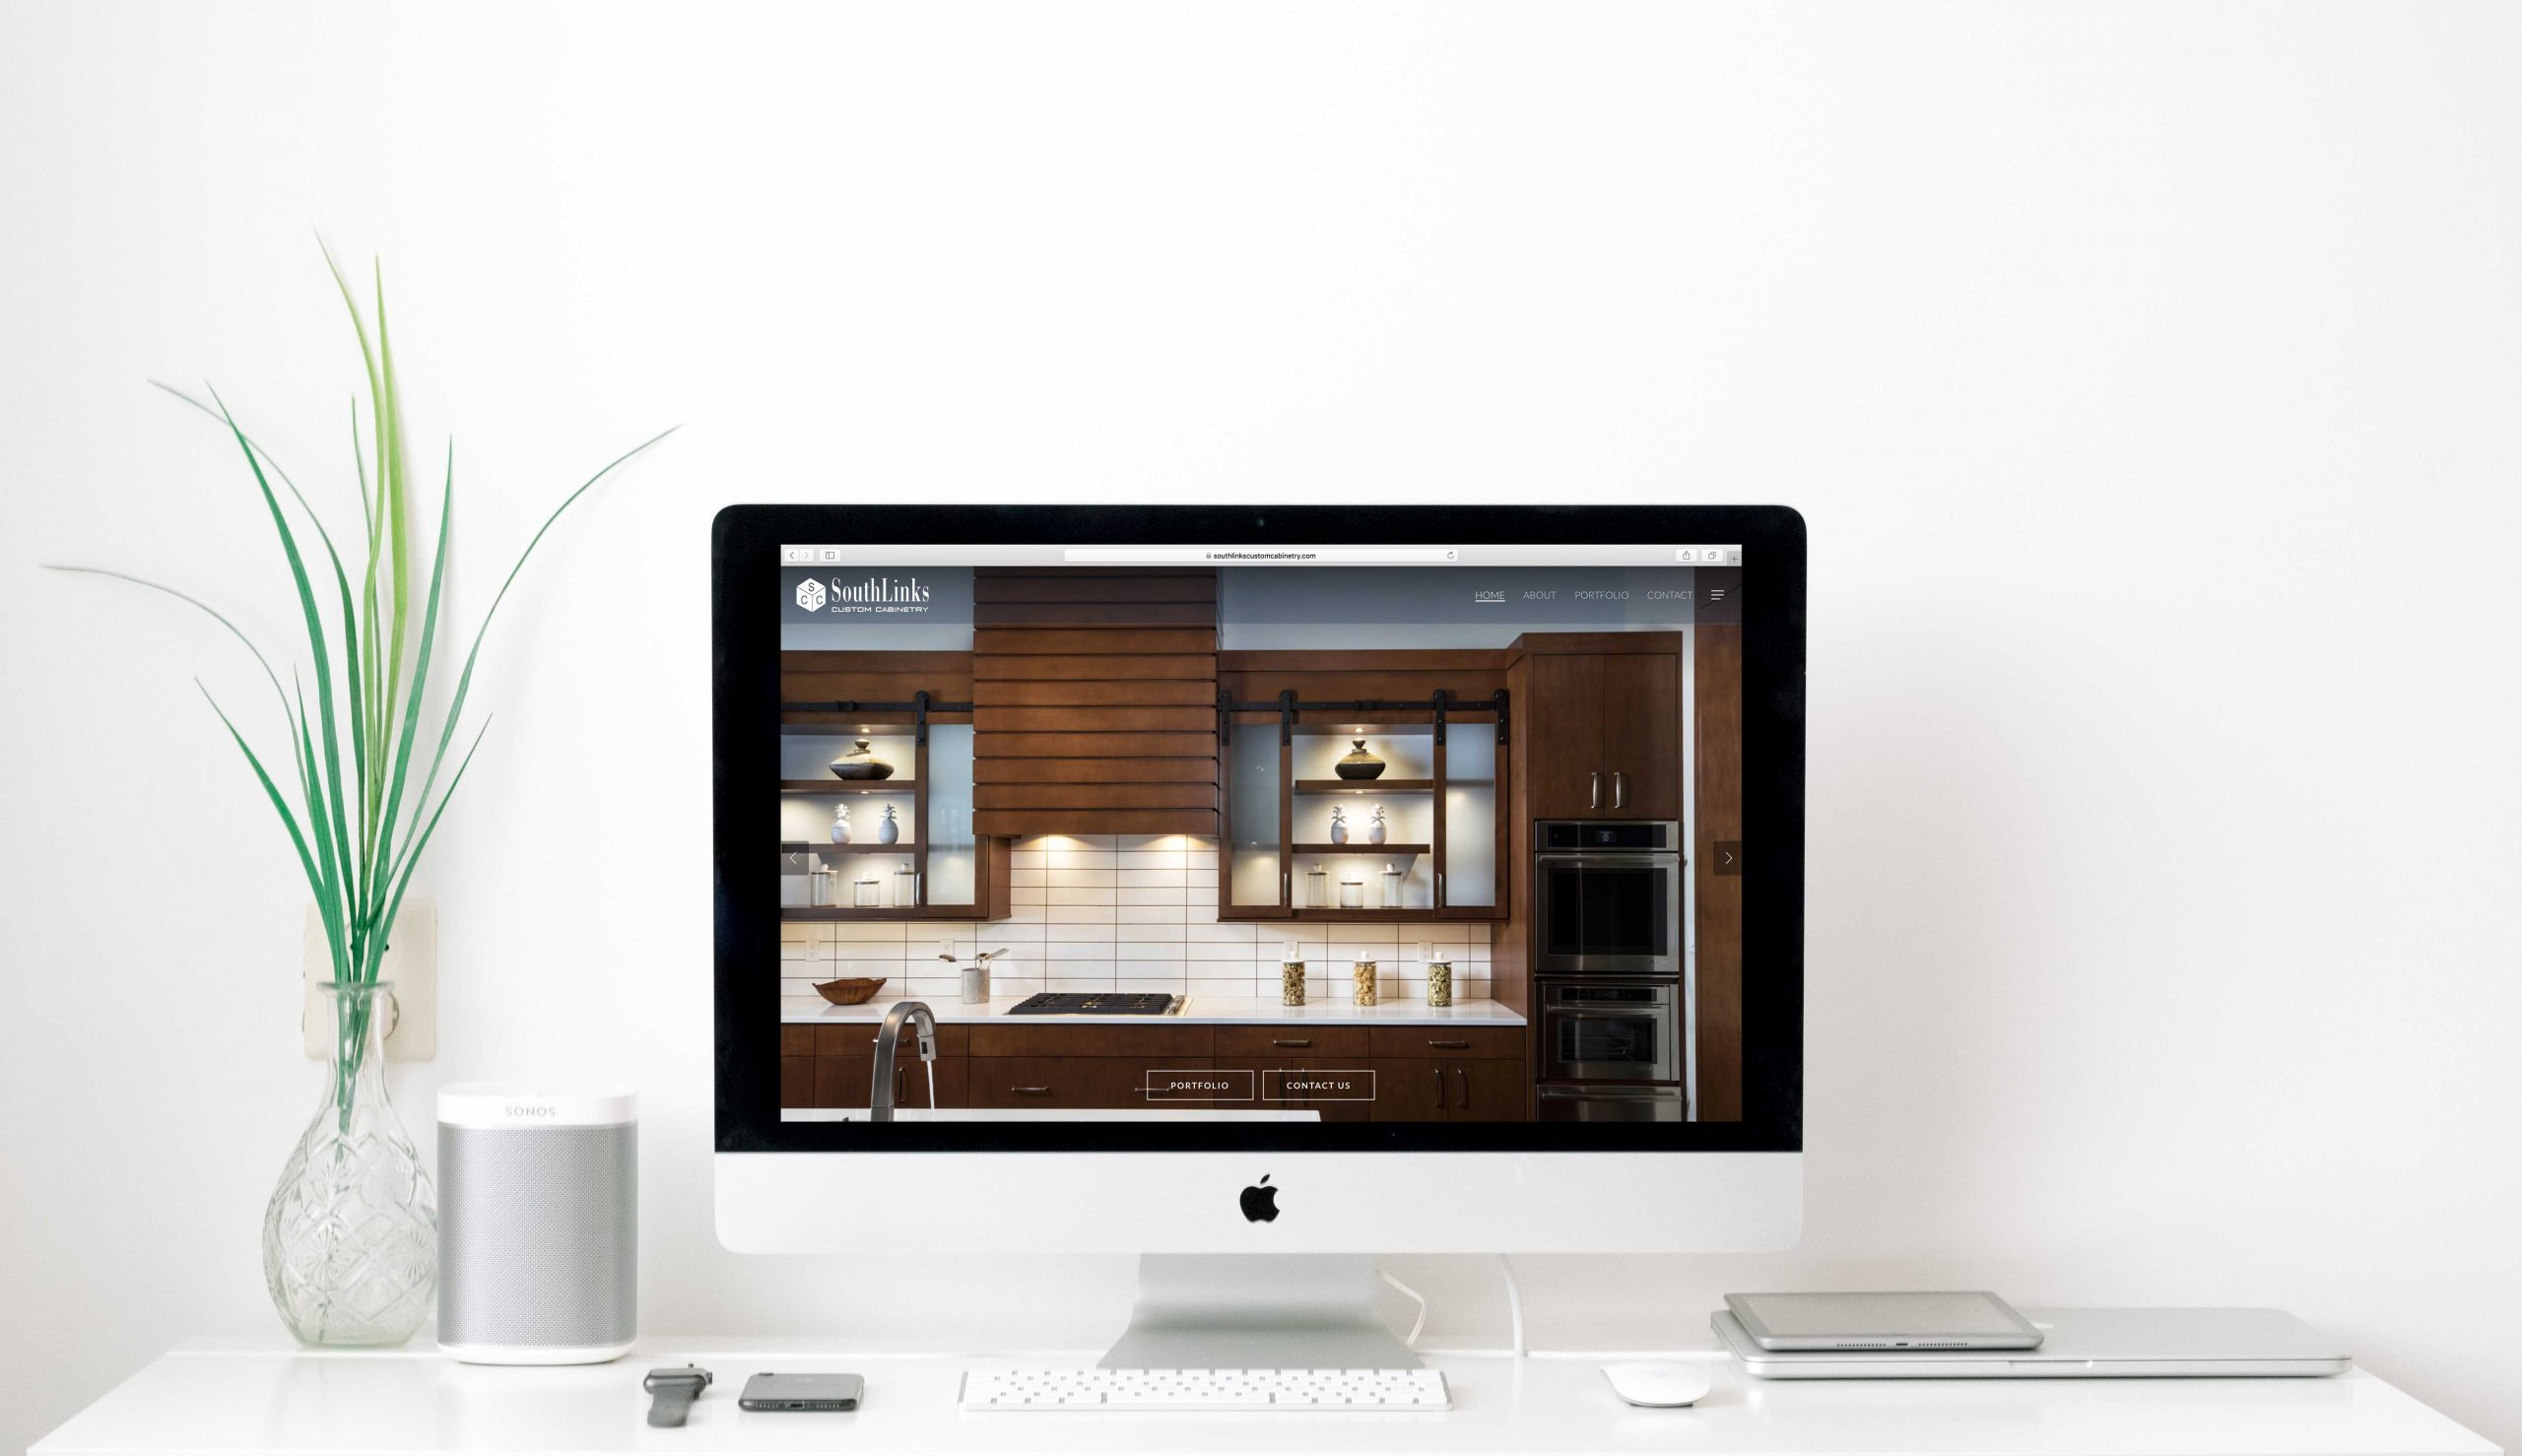 Website Launch for SouthLinks Custom Cabintery